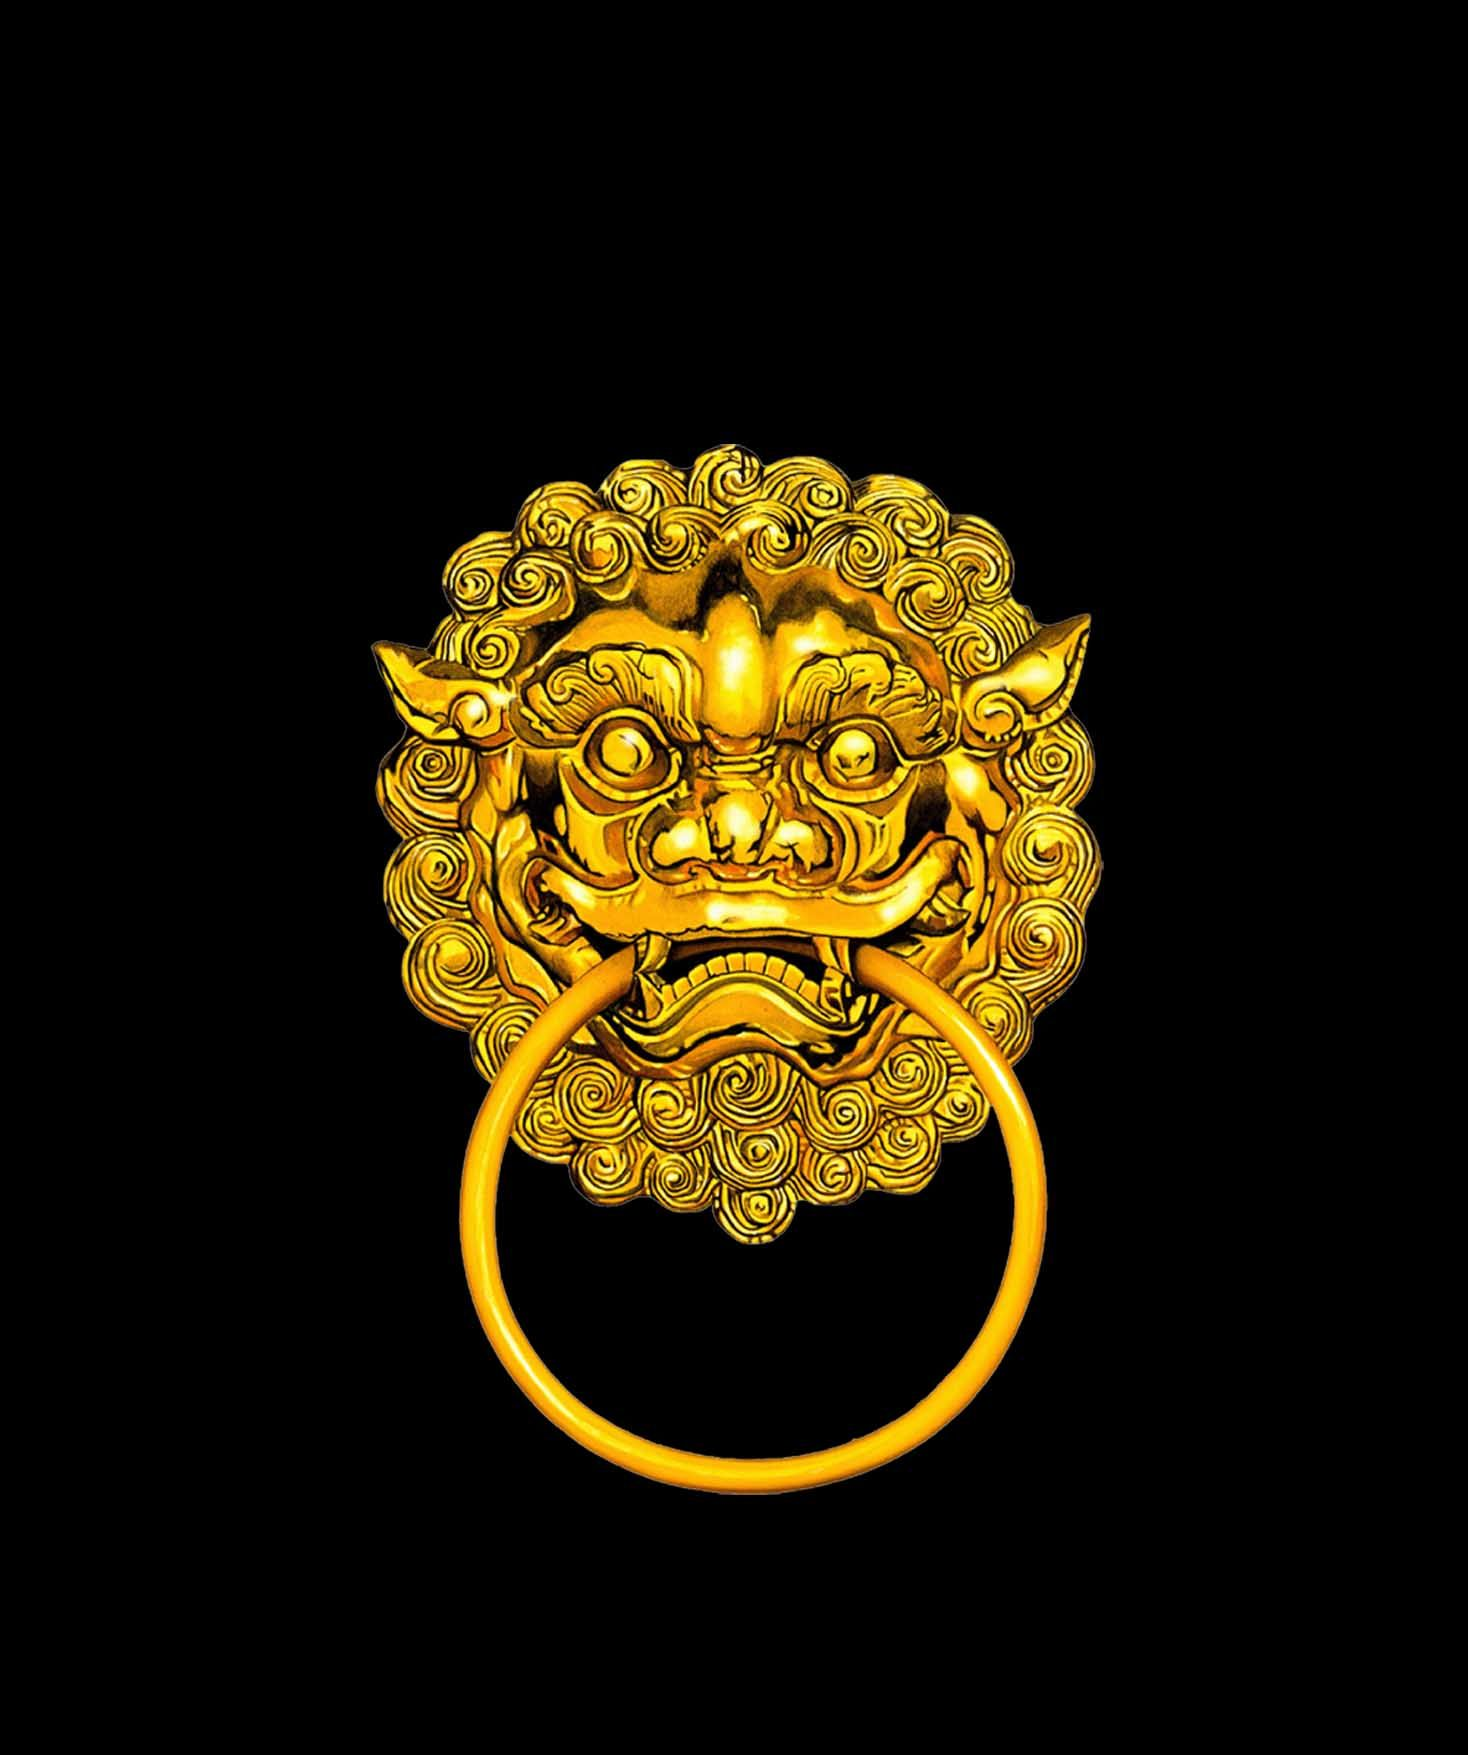 Ornate Chinese-style tiger-head door knocker gold  sc 1 st  Pinterest & Ornate Chinese-style tiger-head door knocker gold   ??   Pinterest ...